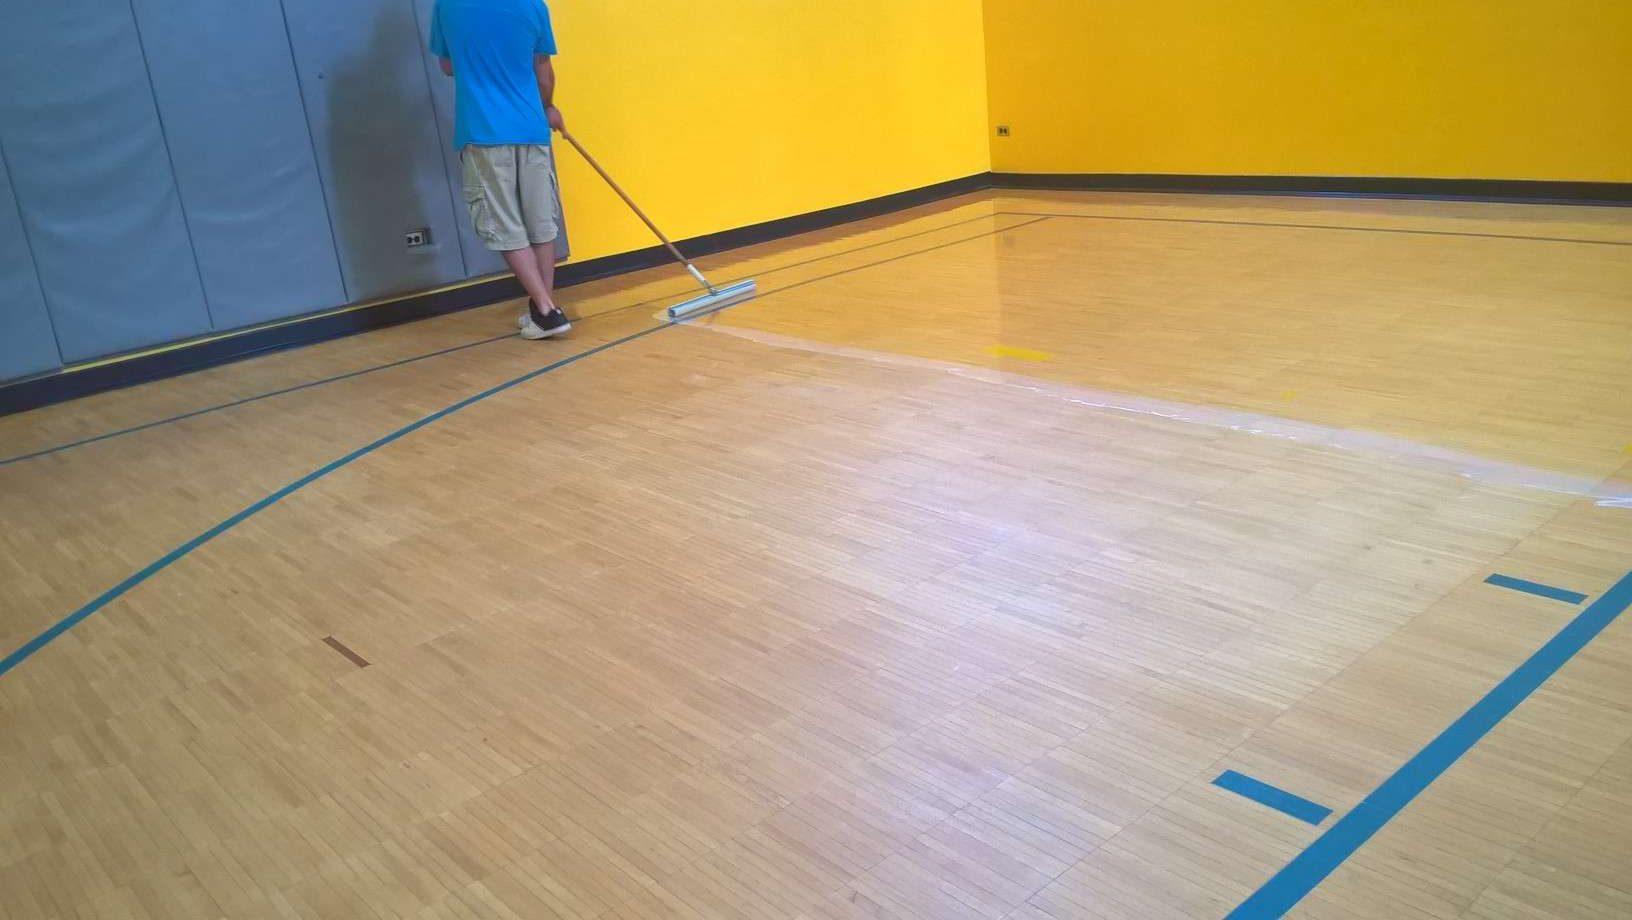 1-Part Urethane Acrylic Clear Finish for Wood Gym Floors MN